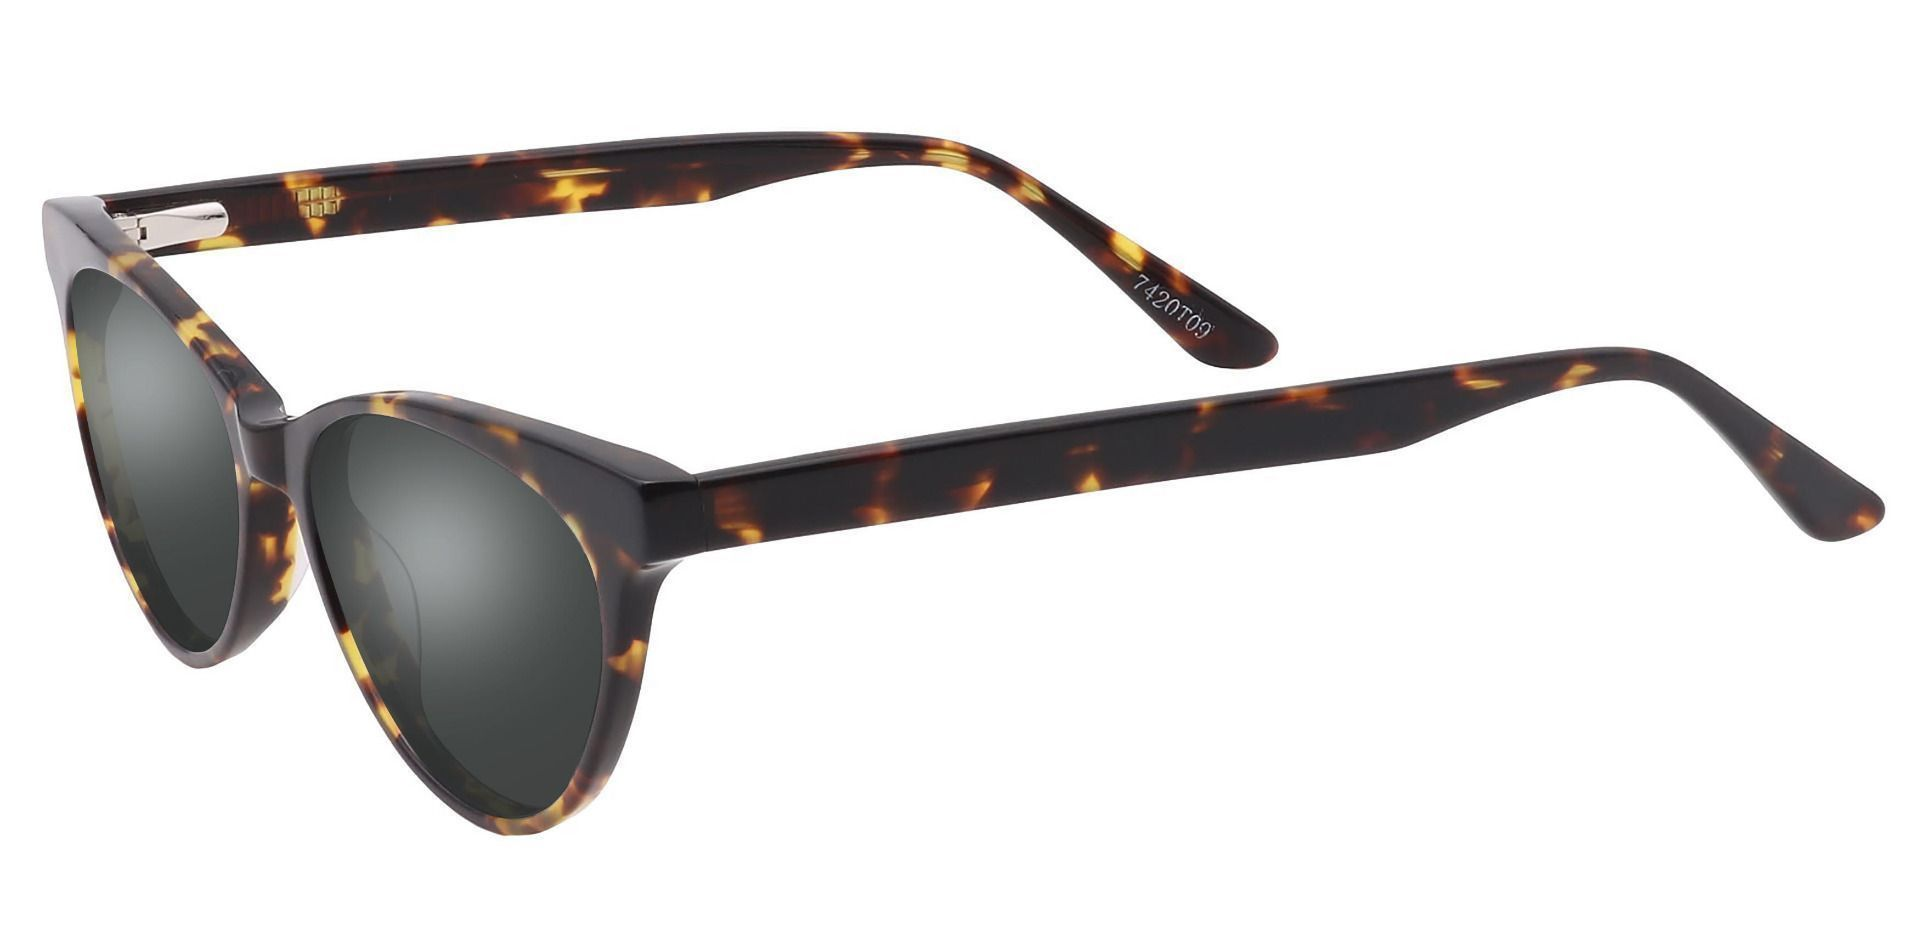 Sabrina Cat Eye Prescription Sunglasses - Tortoise Frame With Gray Lenses